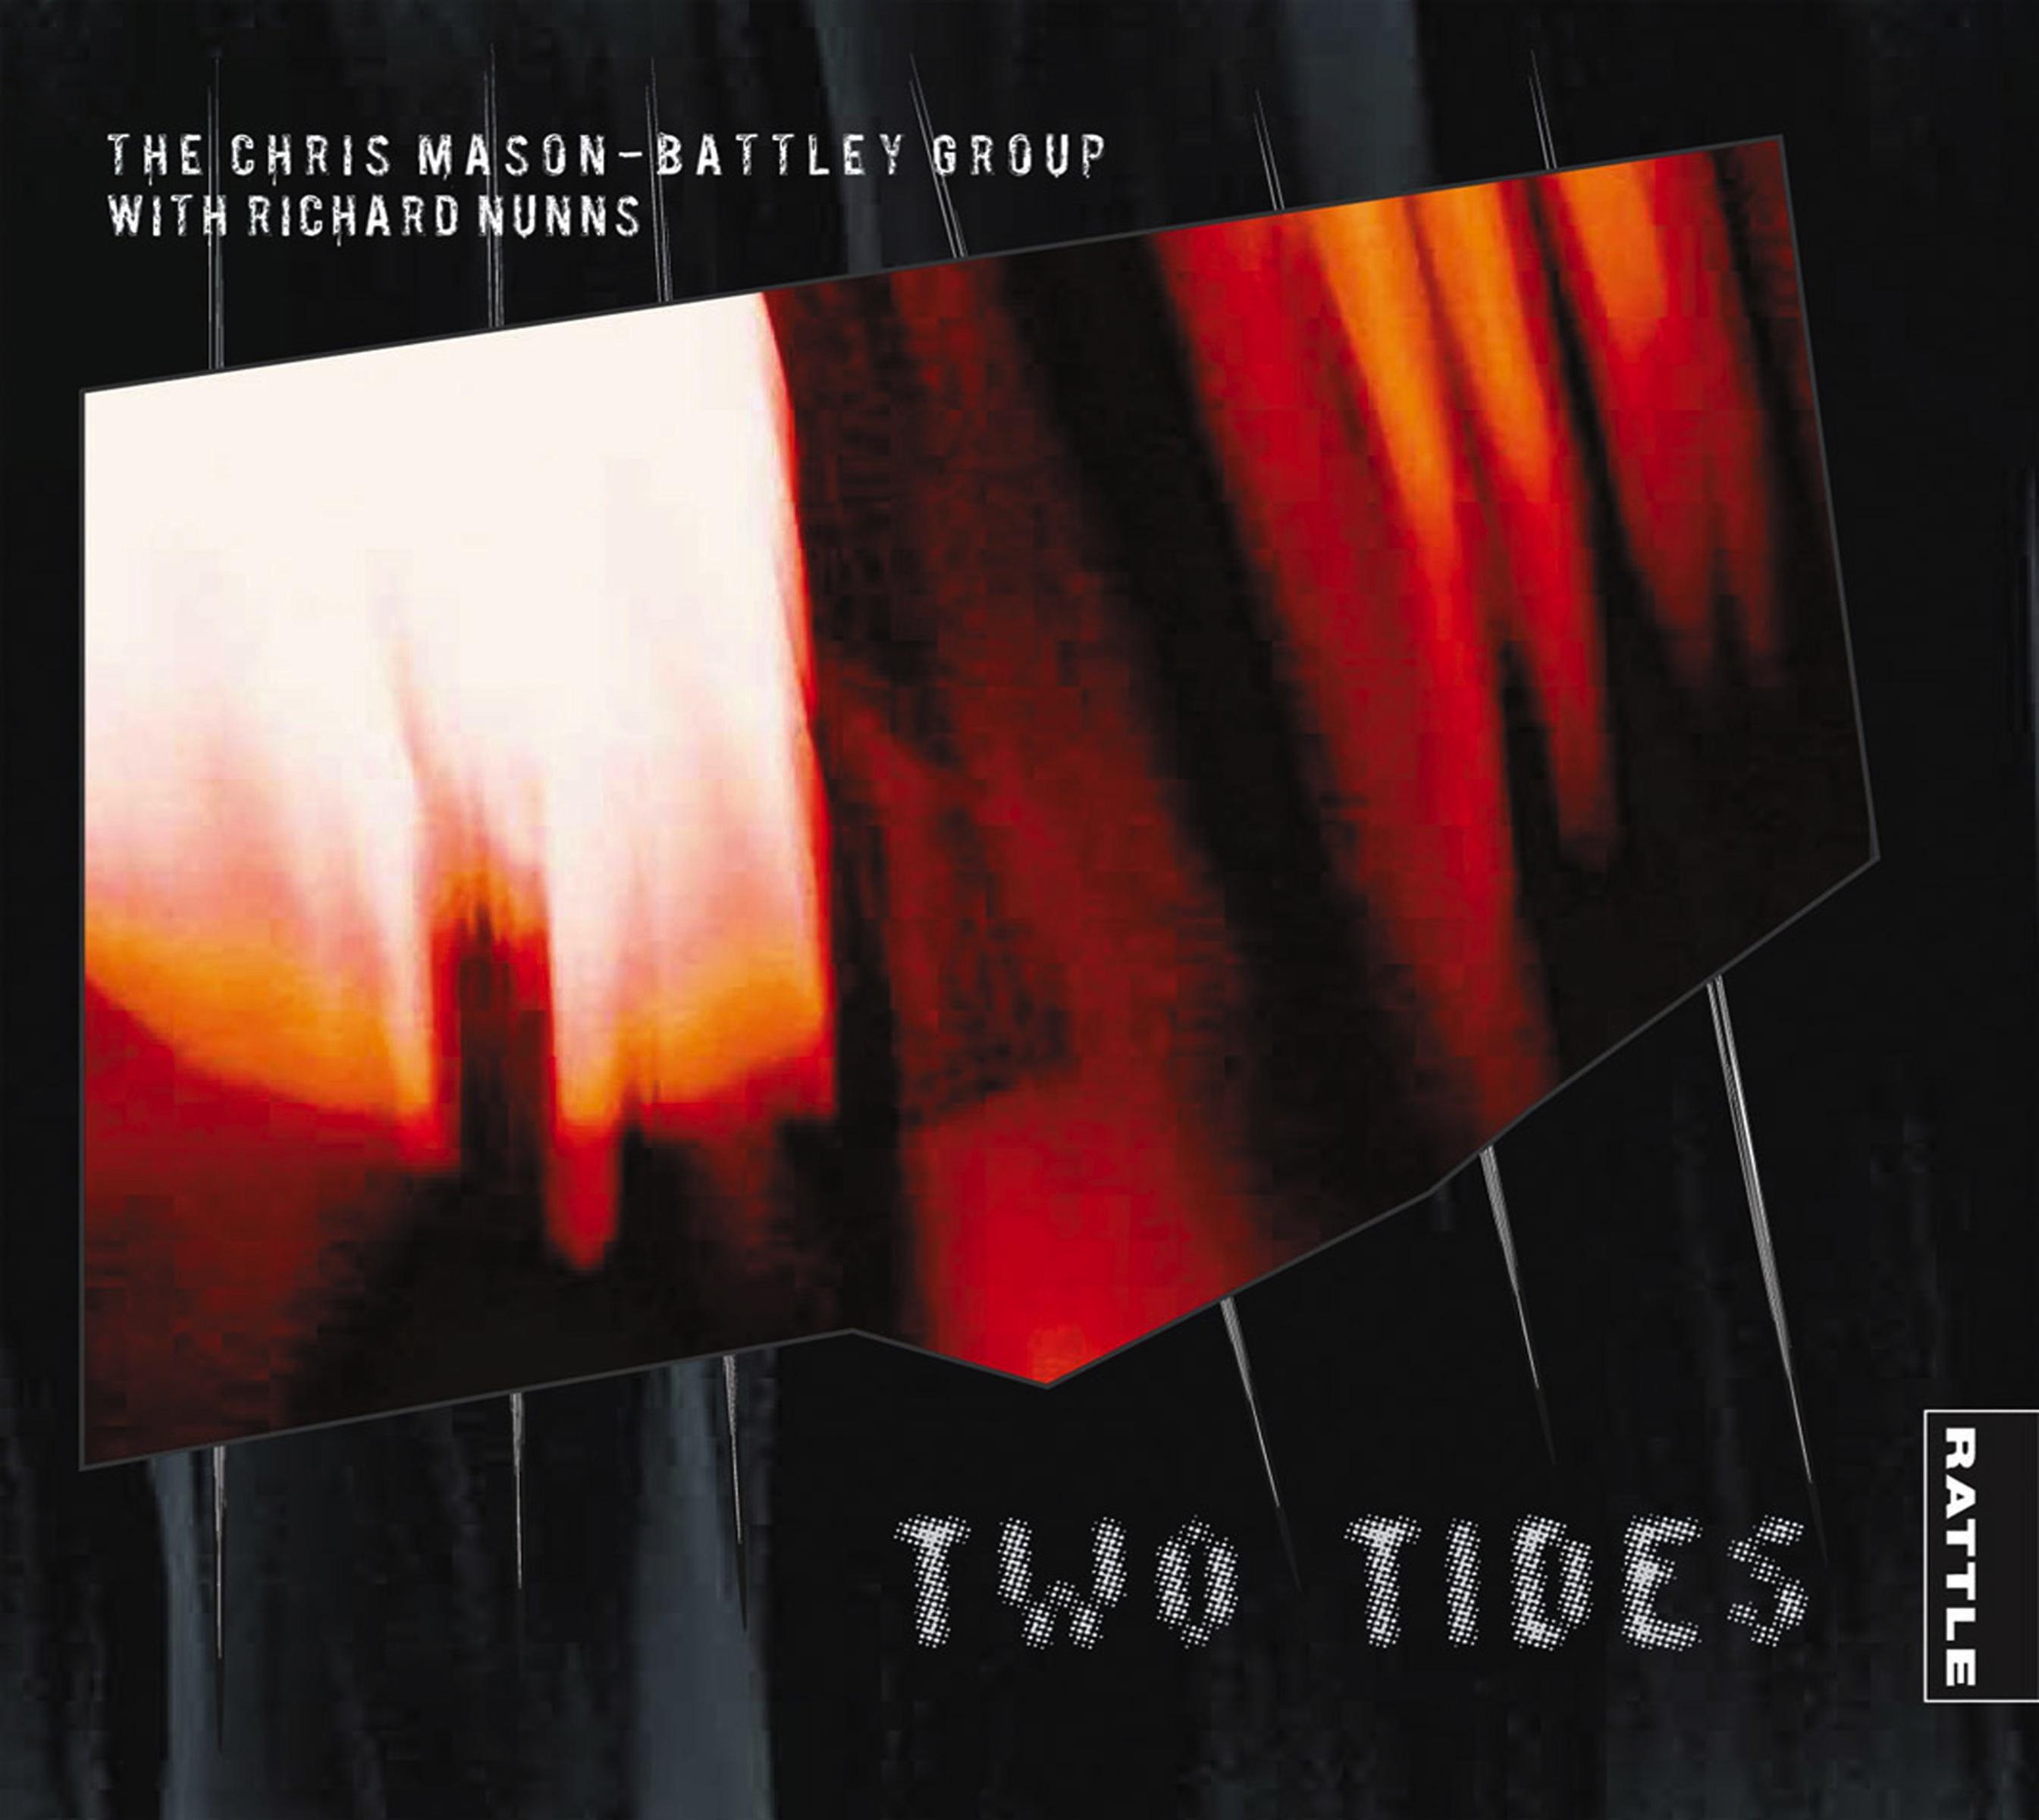 Chris Mason-Battley Group & Richard Nunns | Two Tides - downloadable MP3 ALBUM